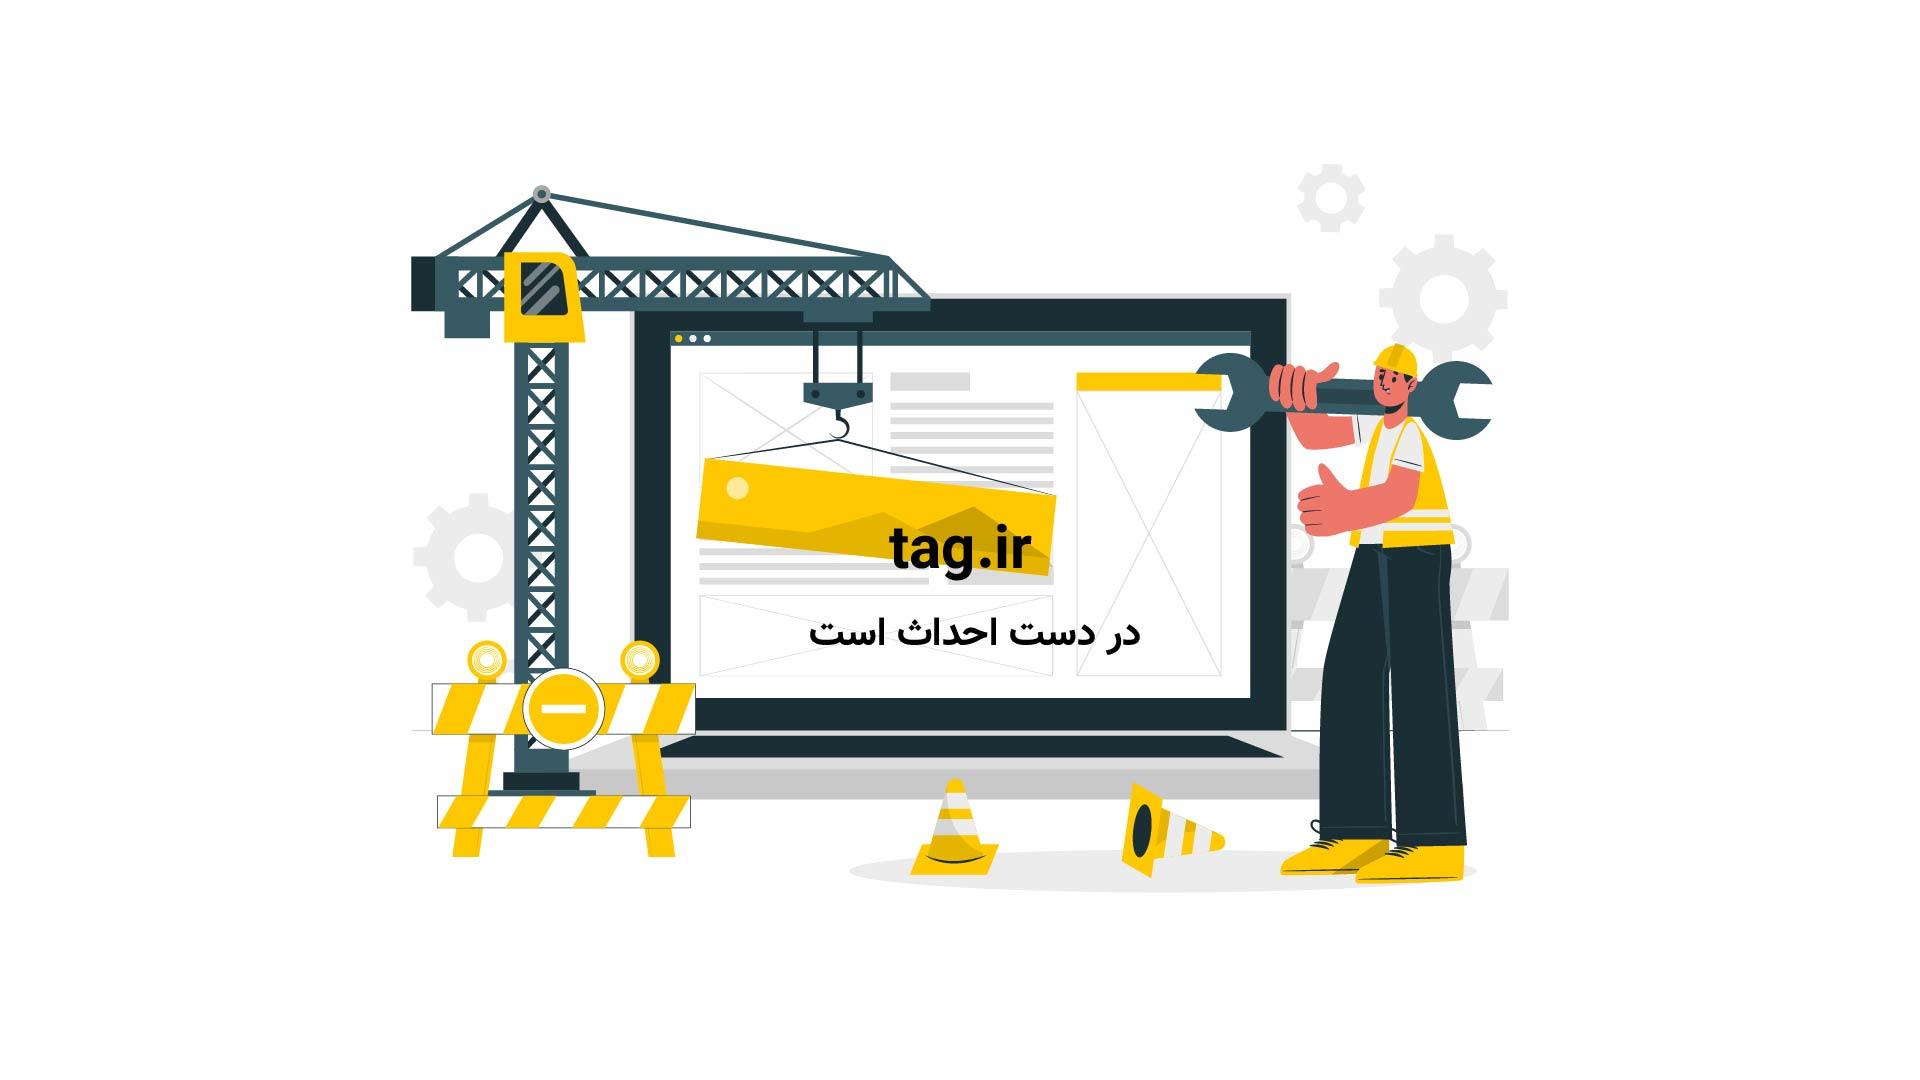 سرقت بانک | تگ